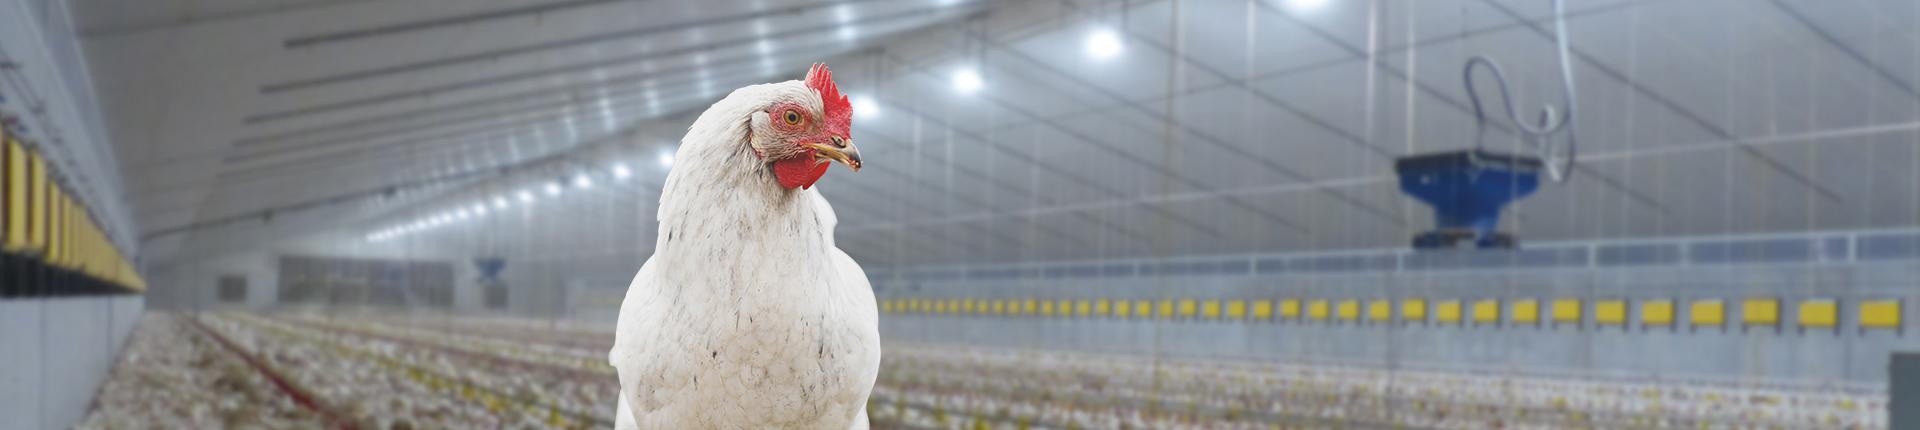 Stallbeleuchtung Geflügel Stalverlichting kippen d'éclairage Volaille barn lighting broilers